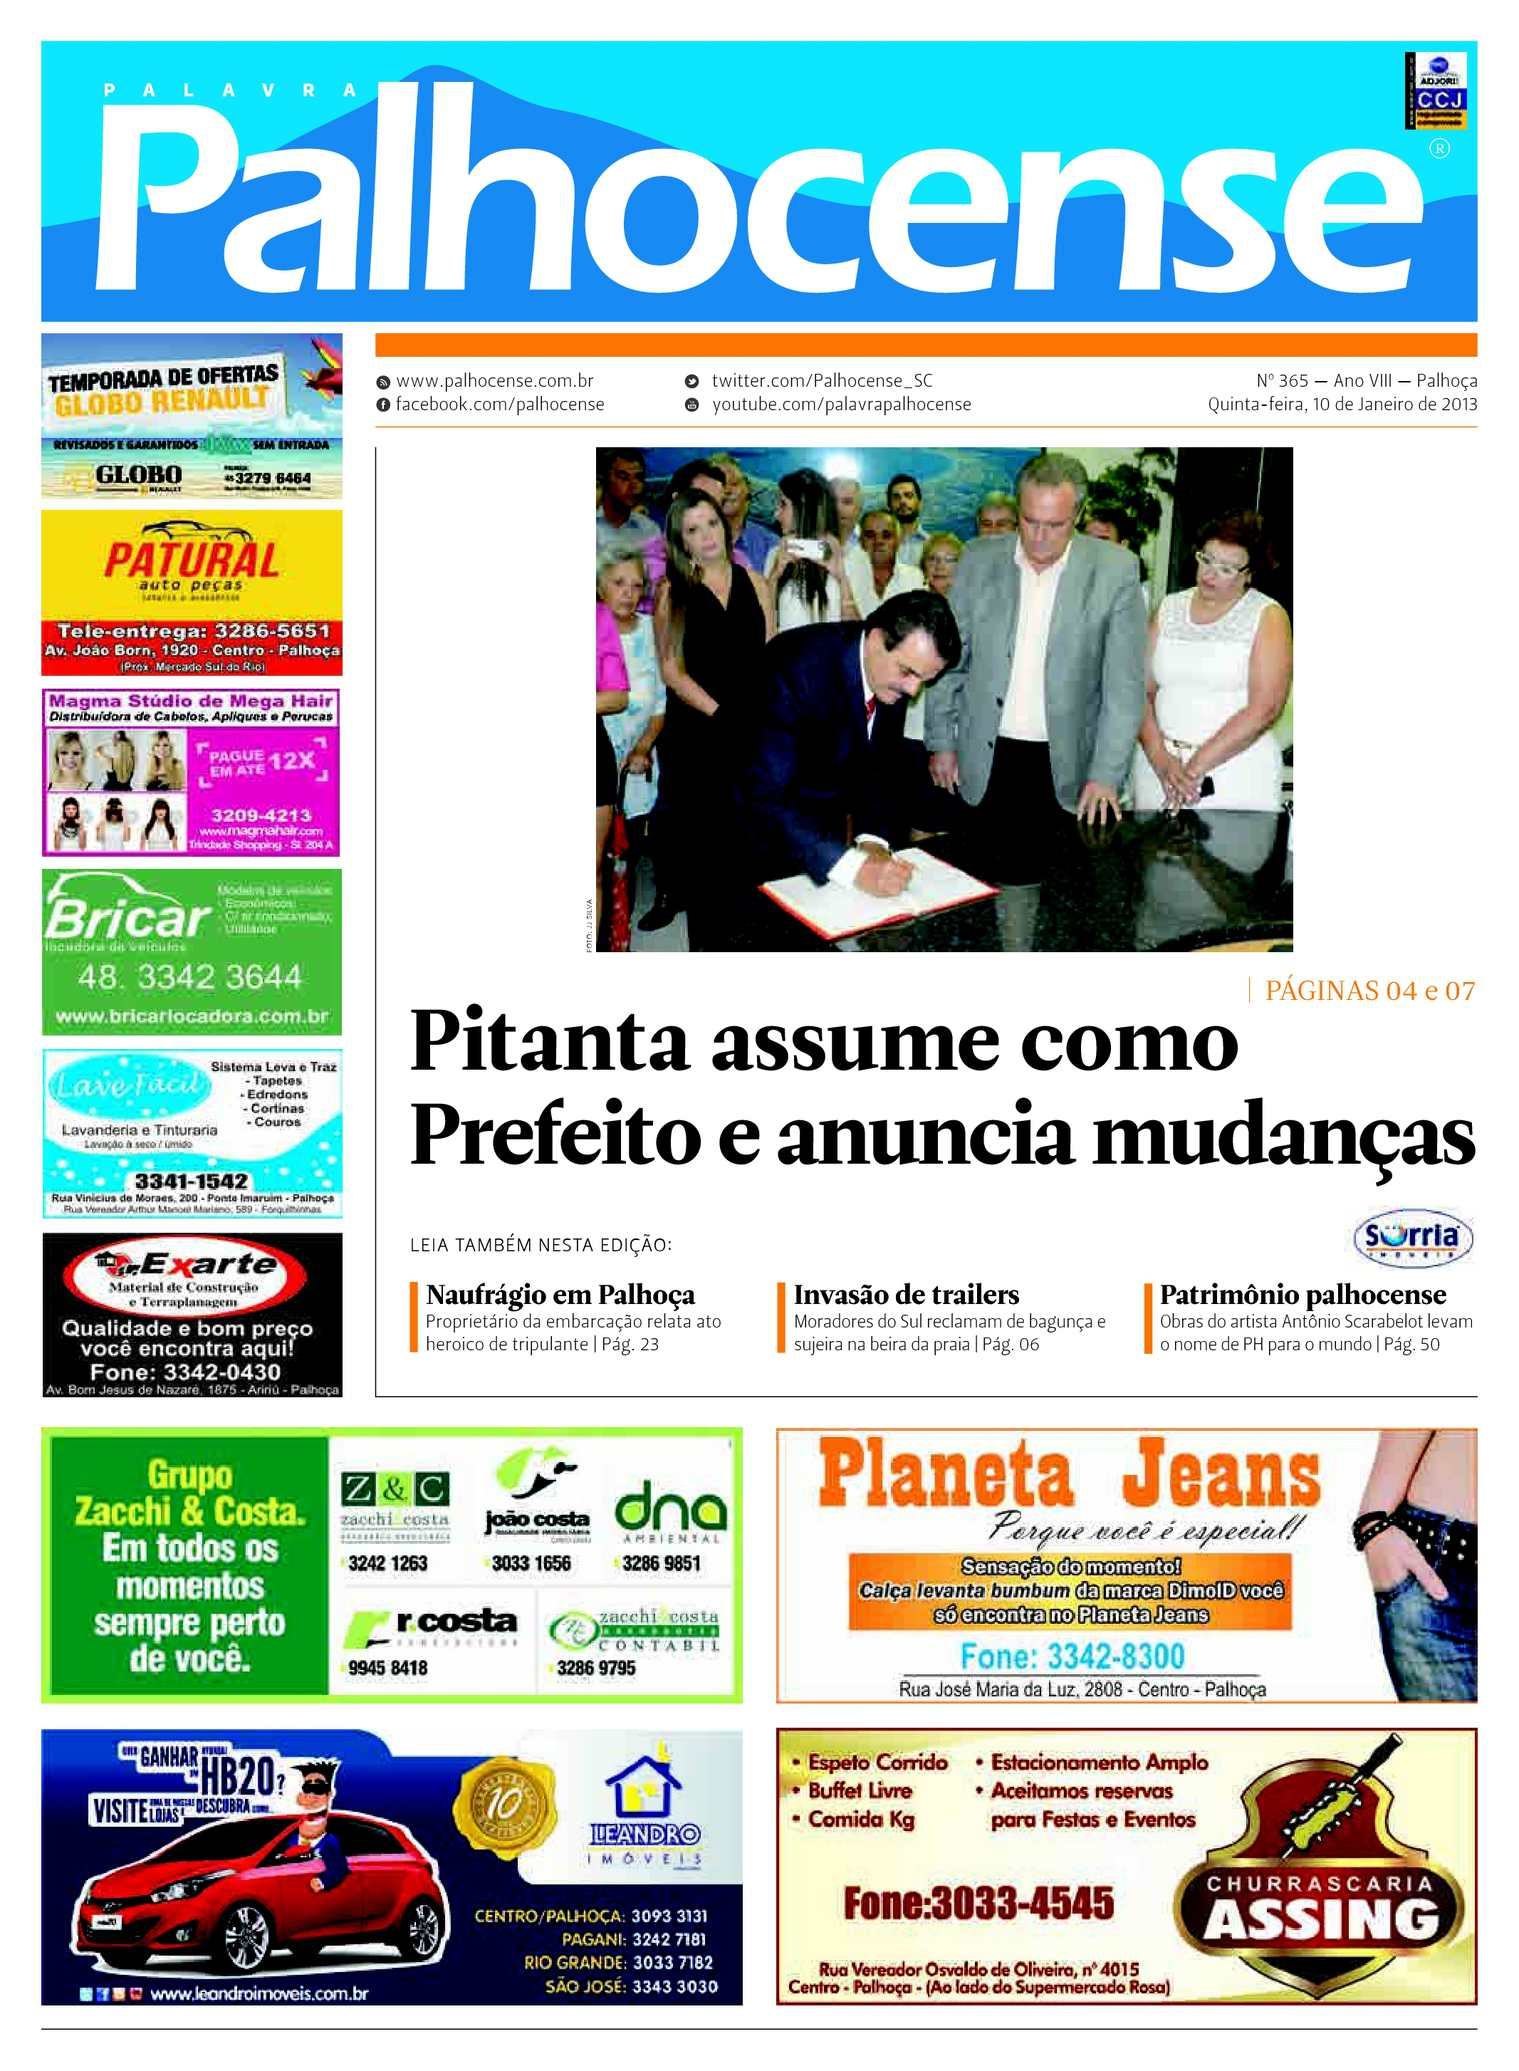 Calaméo - Jornal Palavra Palhocense - Edição 365 b0cb159aebbd2